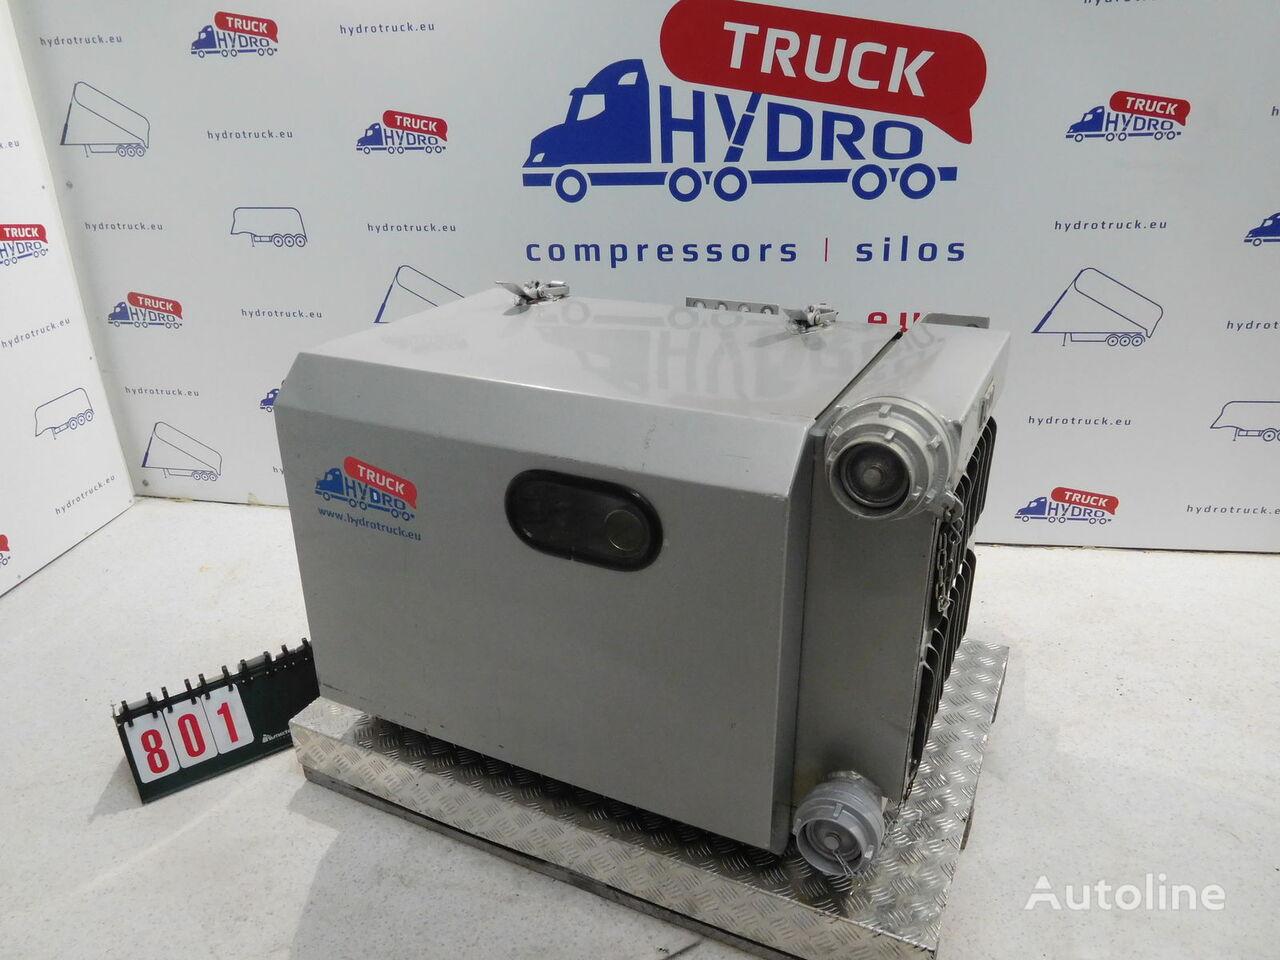 TYPHON 2C MOUVEX BLACKMER W ZABUDOWIE RTI Druckluftkompressor für Tankauflieger